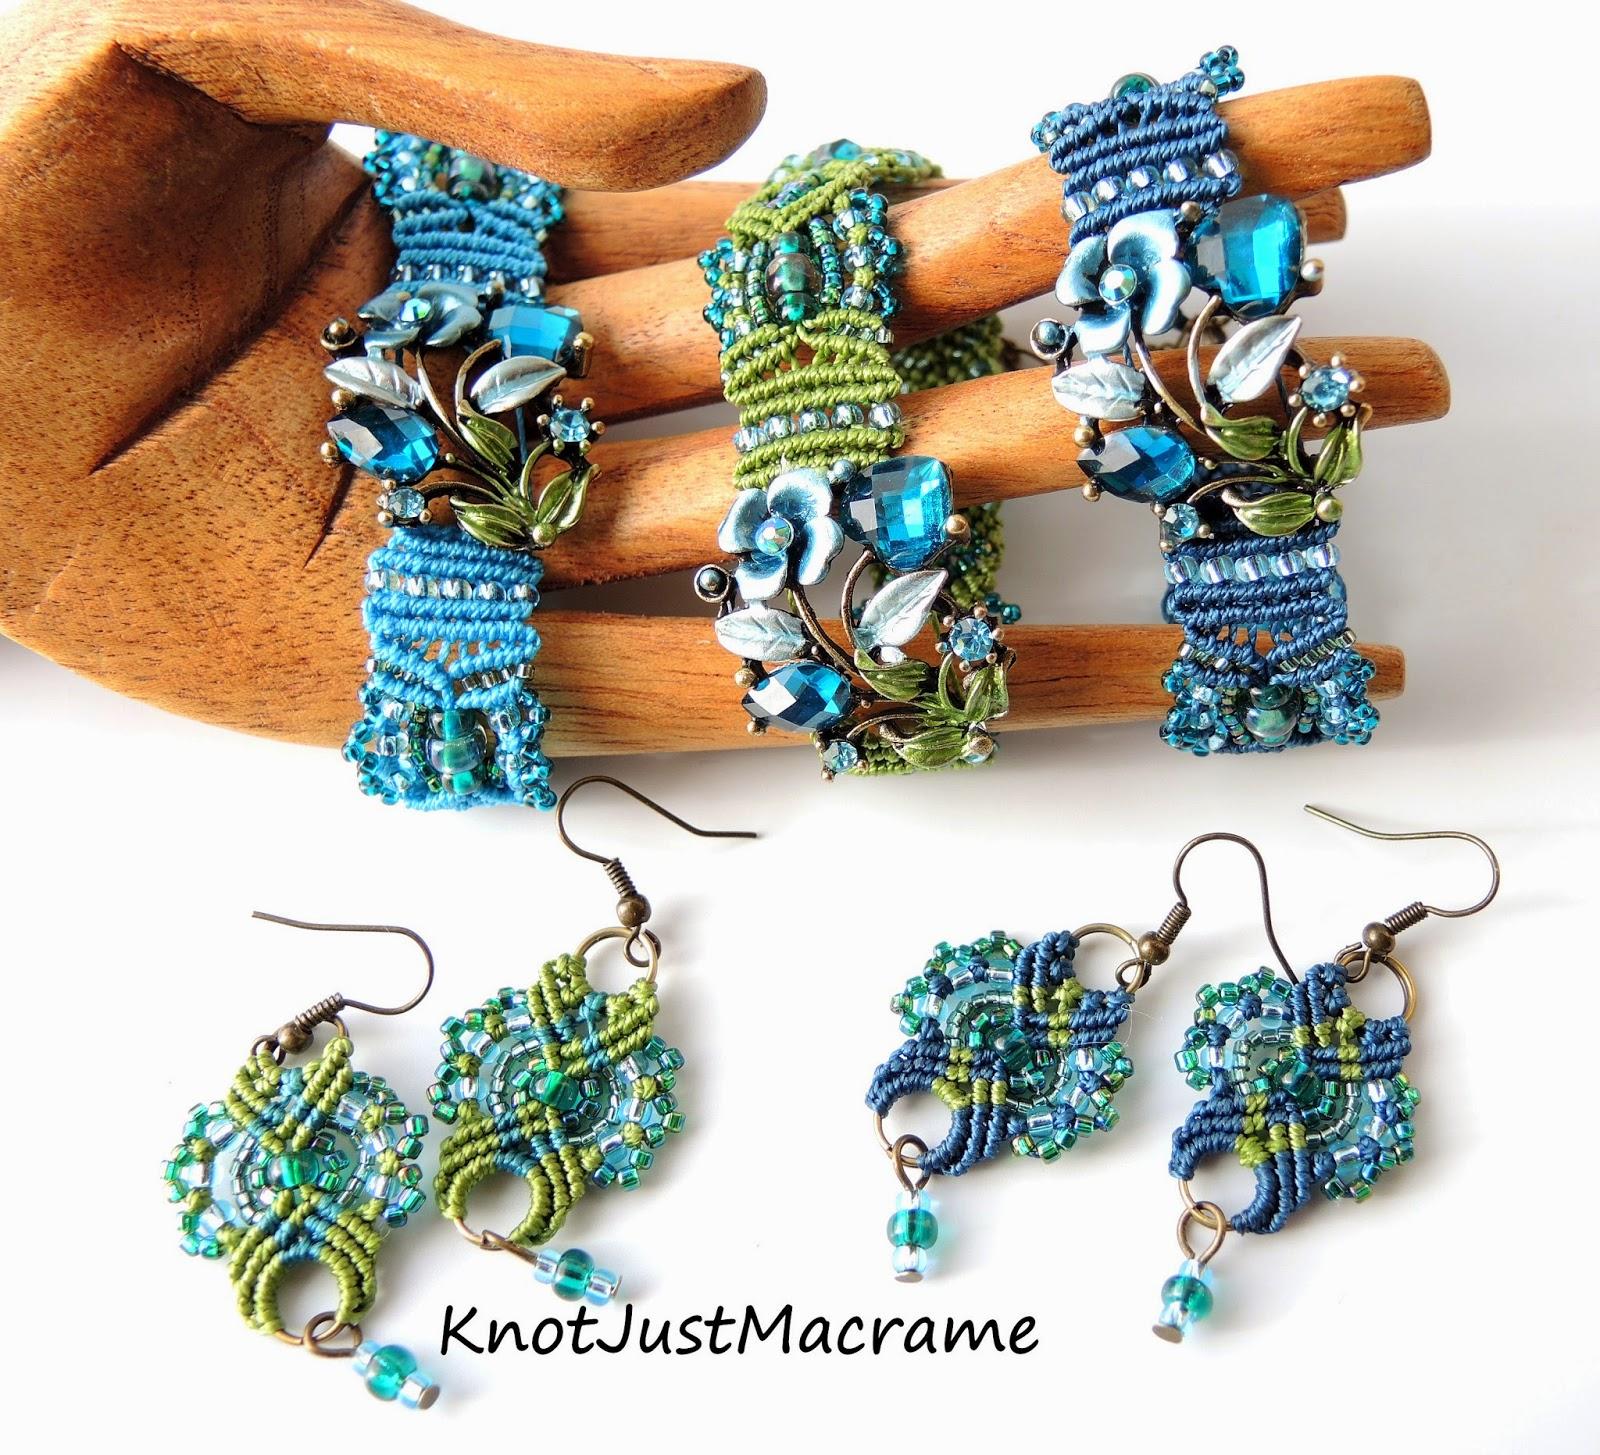 Micro macrame bracelets and earrings by Sherri Stokey of Knot Just Macrame.